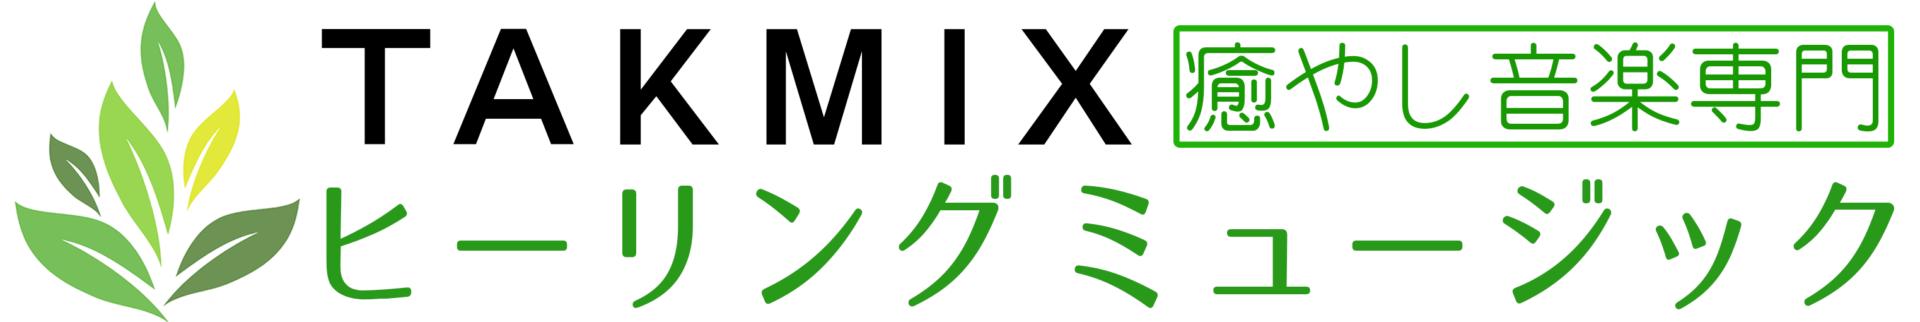 TAKMIXヒーリングミュージック